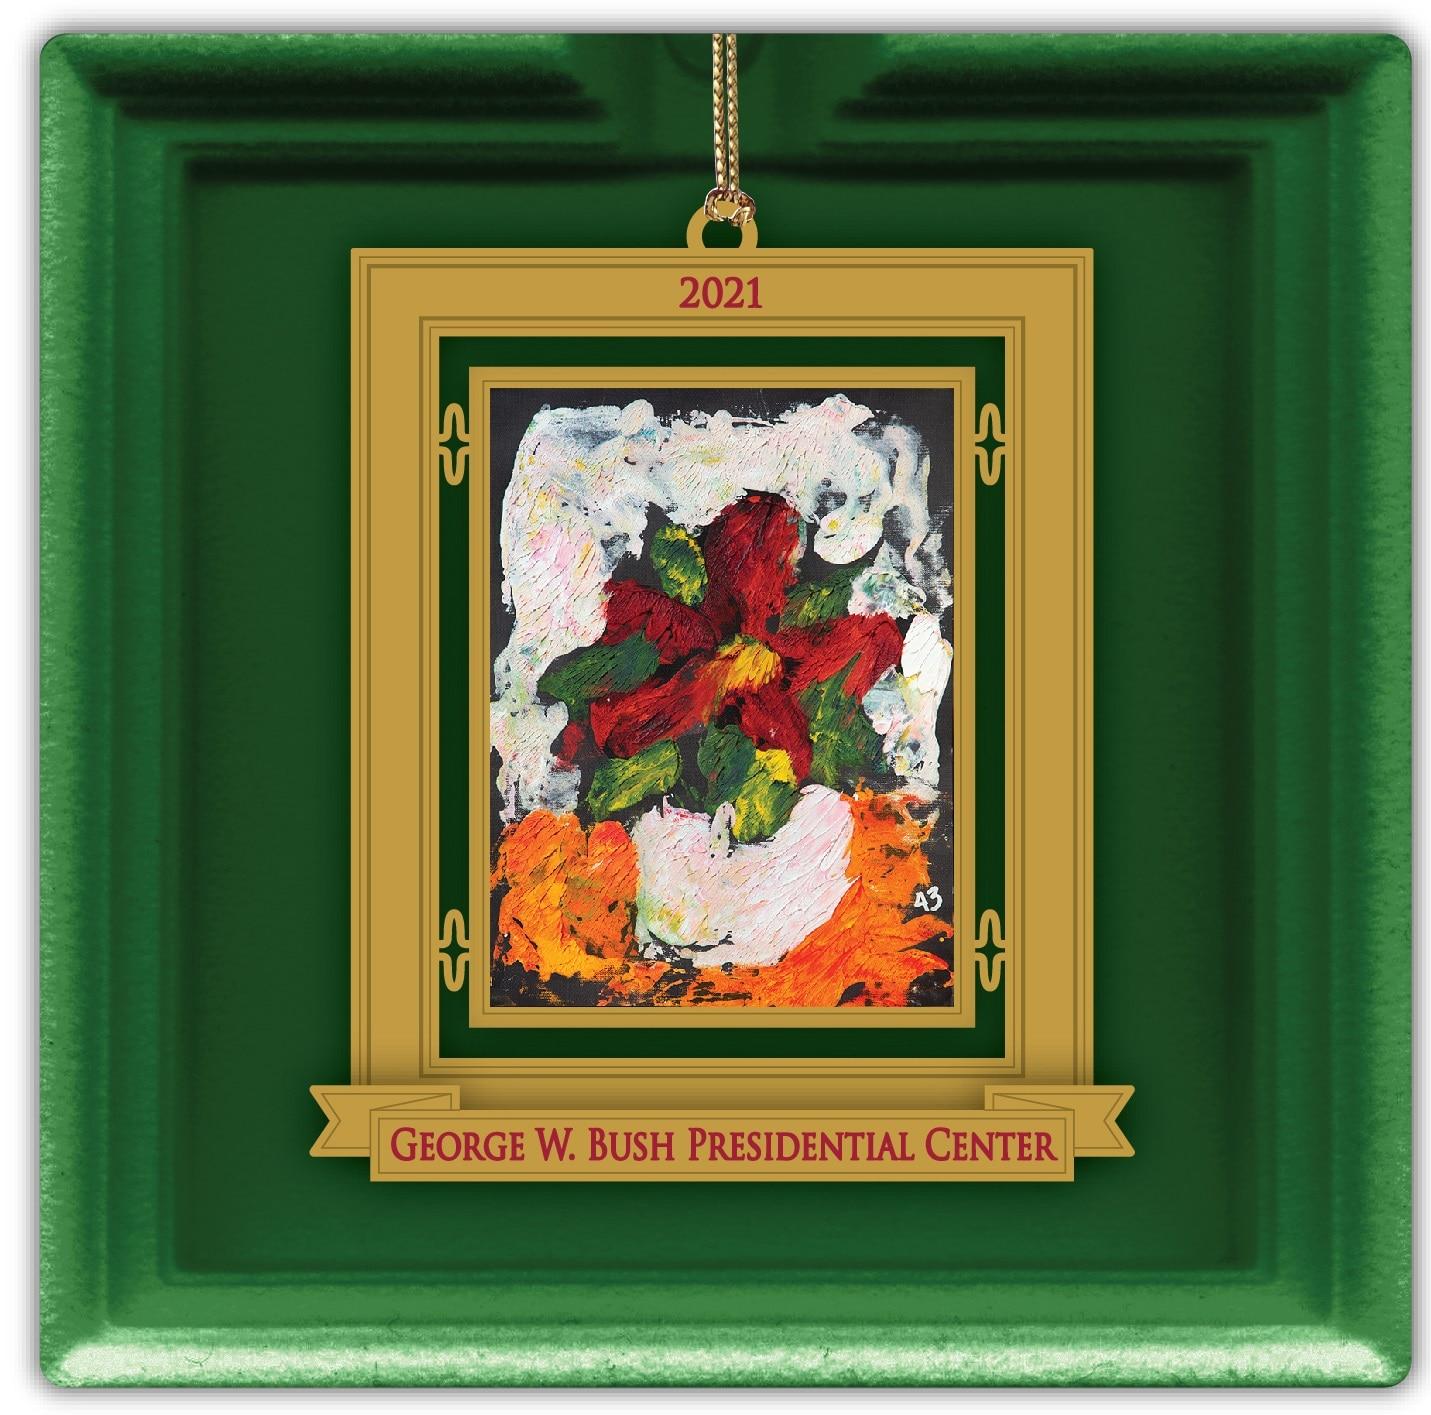 2021 Custom GWBPC Ornament